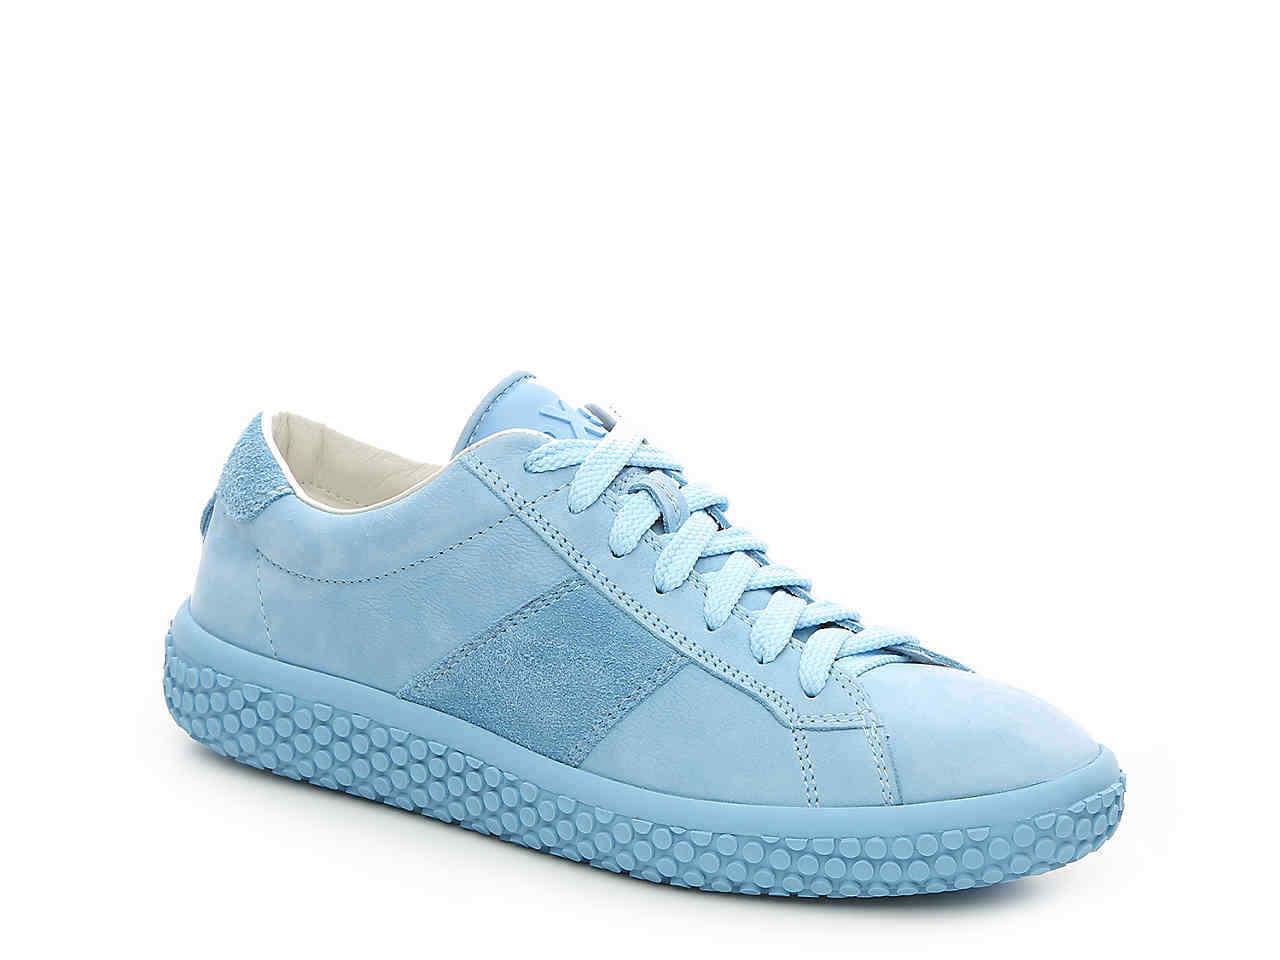 oXs ITALY WOOBIE Leather Sneakers Travel Shoe 8.5, 10 NIB Black~Navy~Blue $285